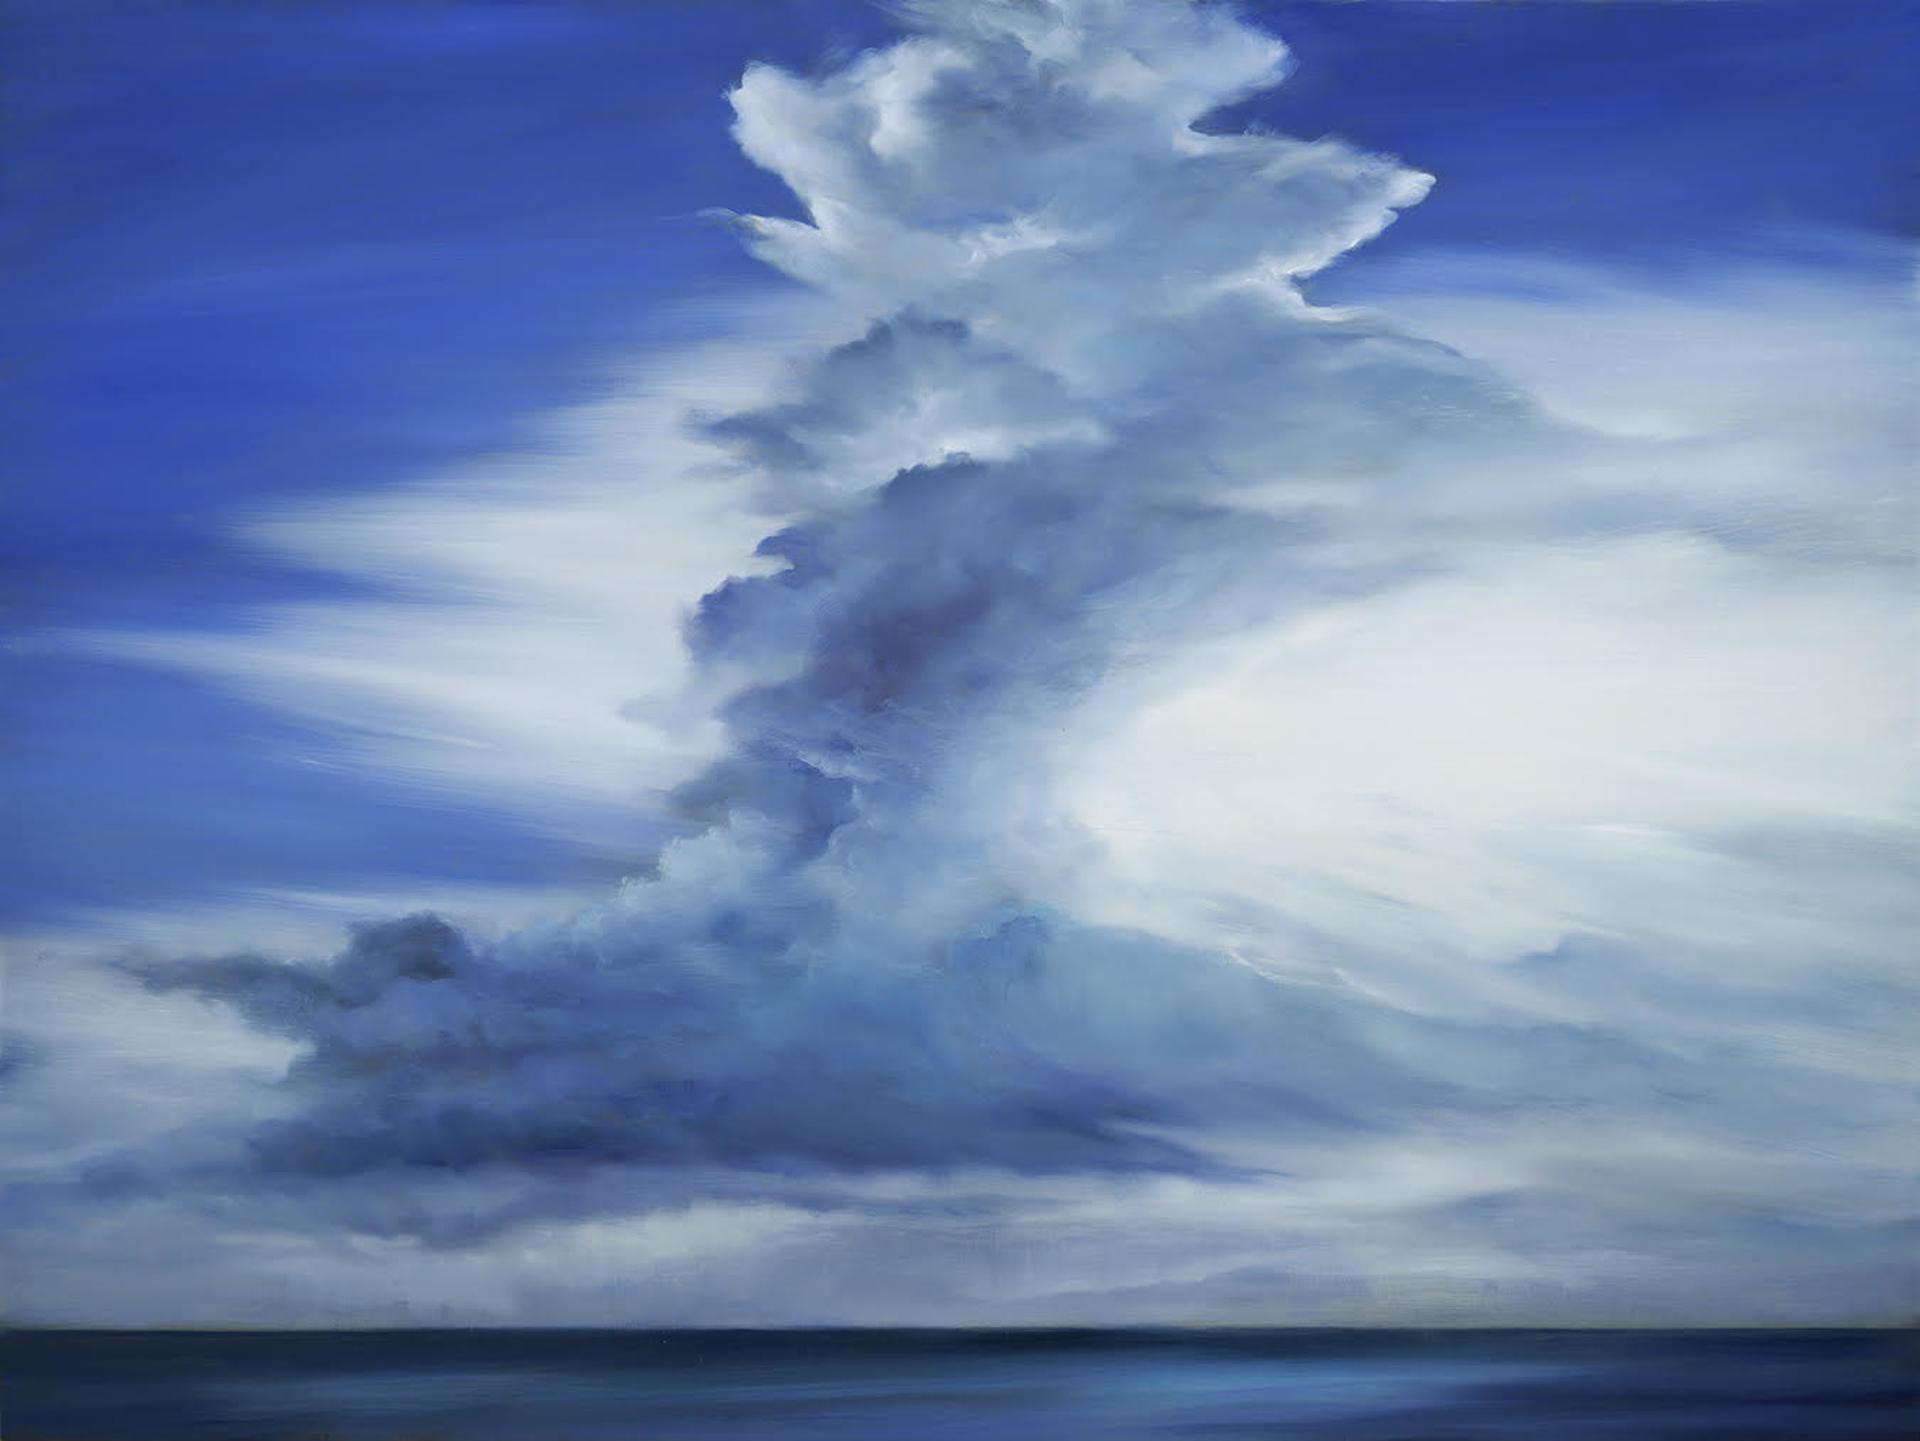 Symphony in Blue by Cheryl Kline